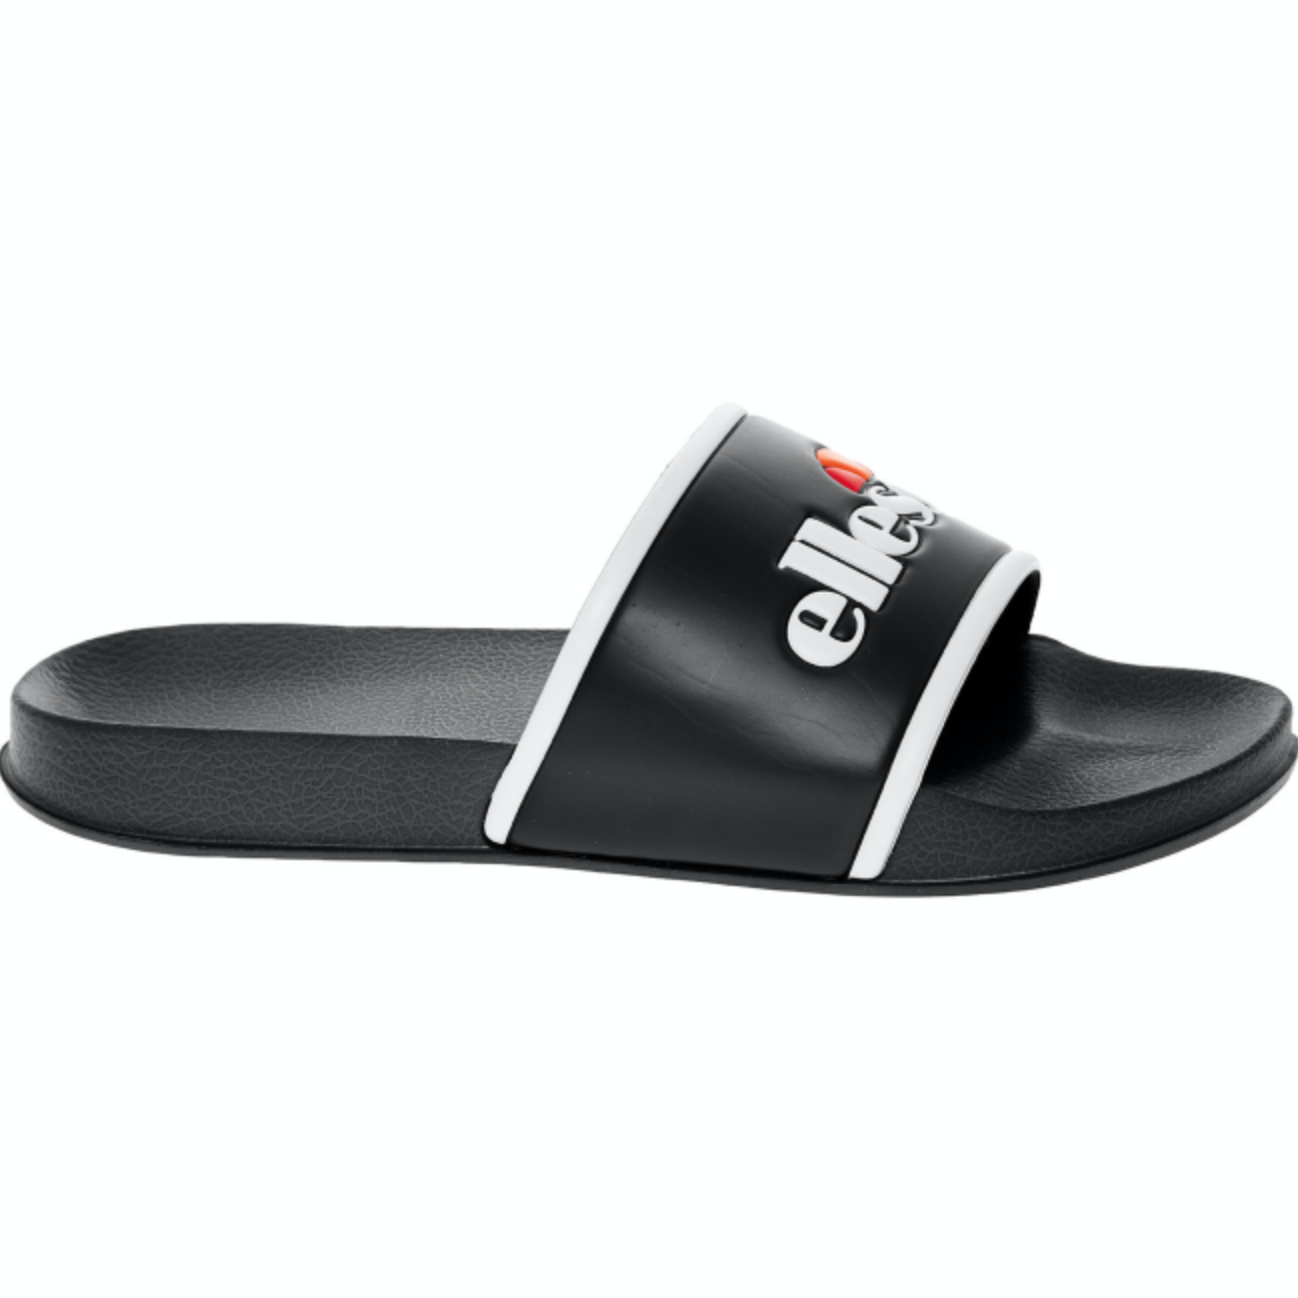 ELLESSE White & Black Logo Slides - UK 6/EU 40